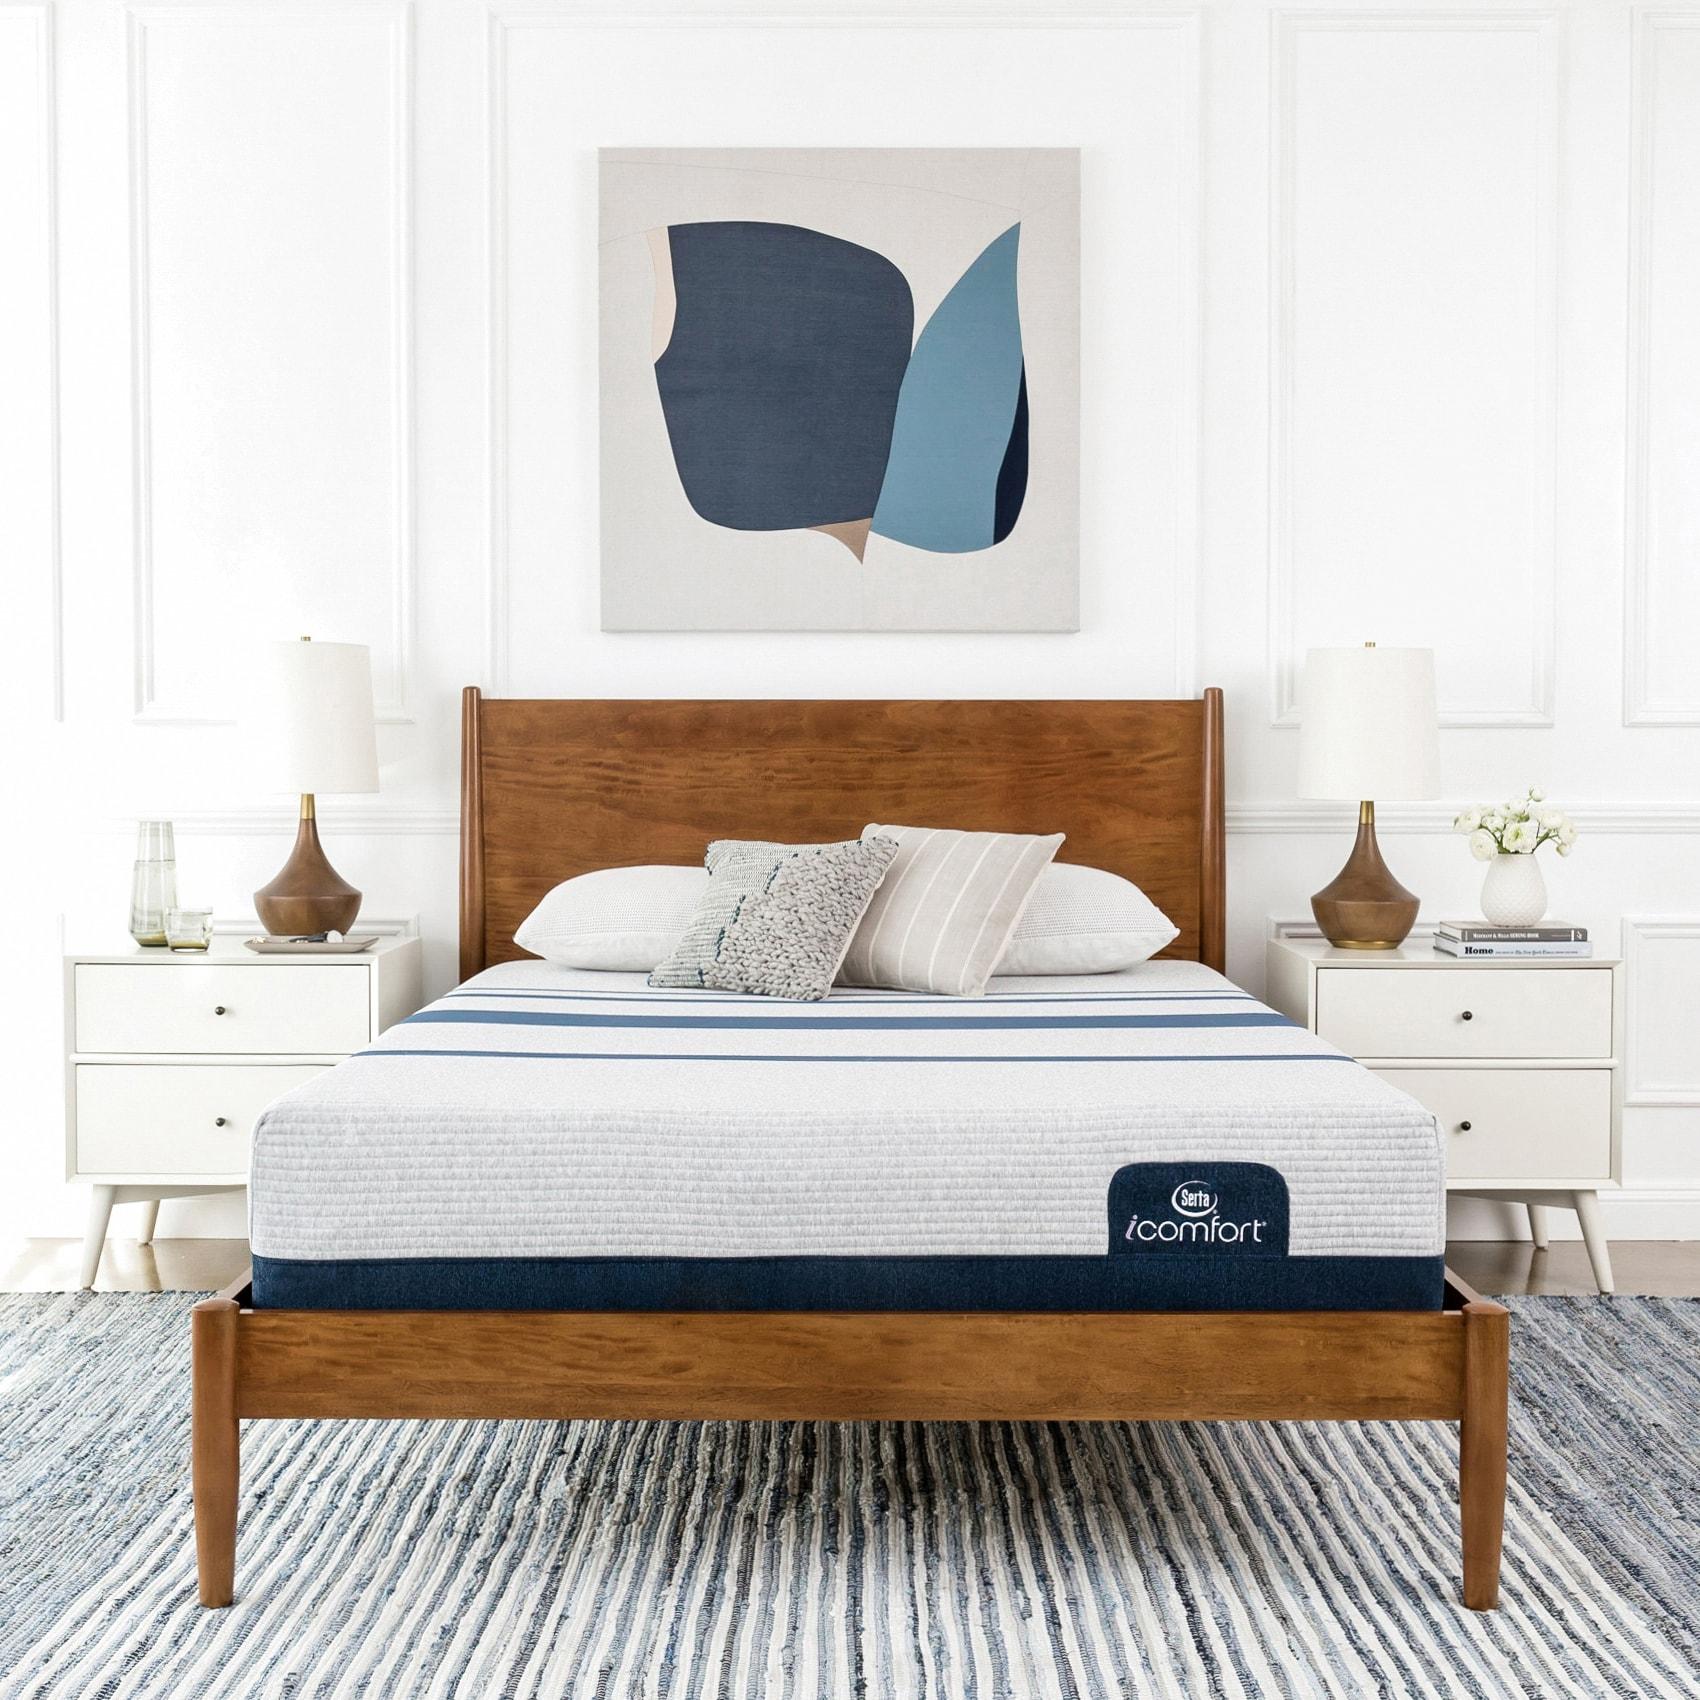 Serta icomfort blue 300 11 inch queen size memory foam mattress